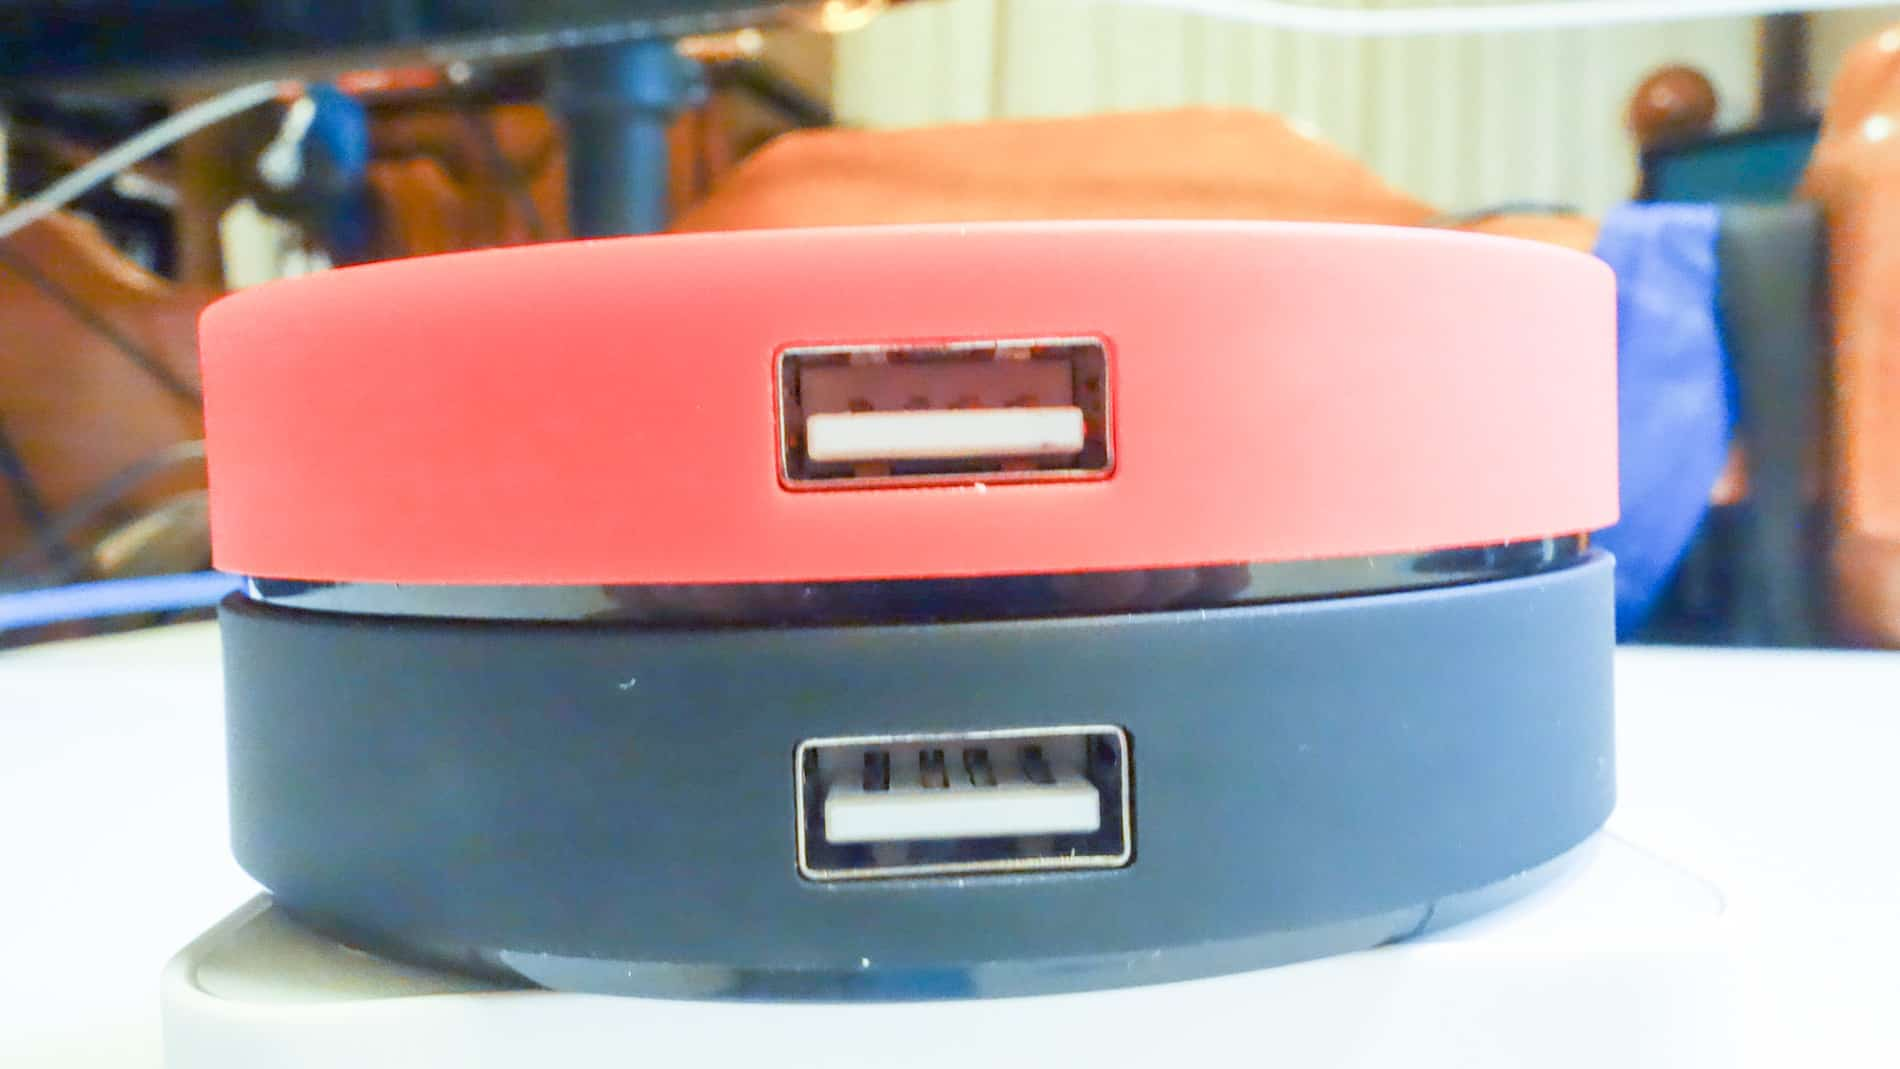 sungale stackable power disks review ah 6